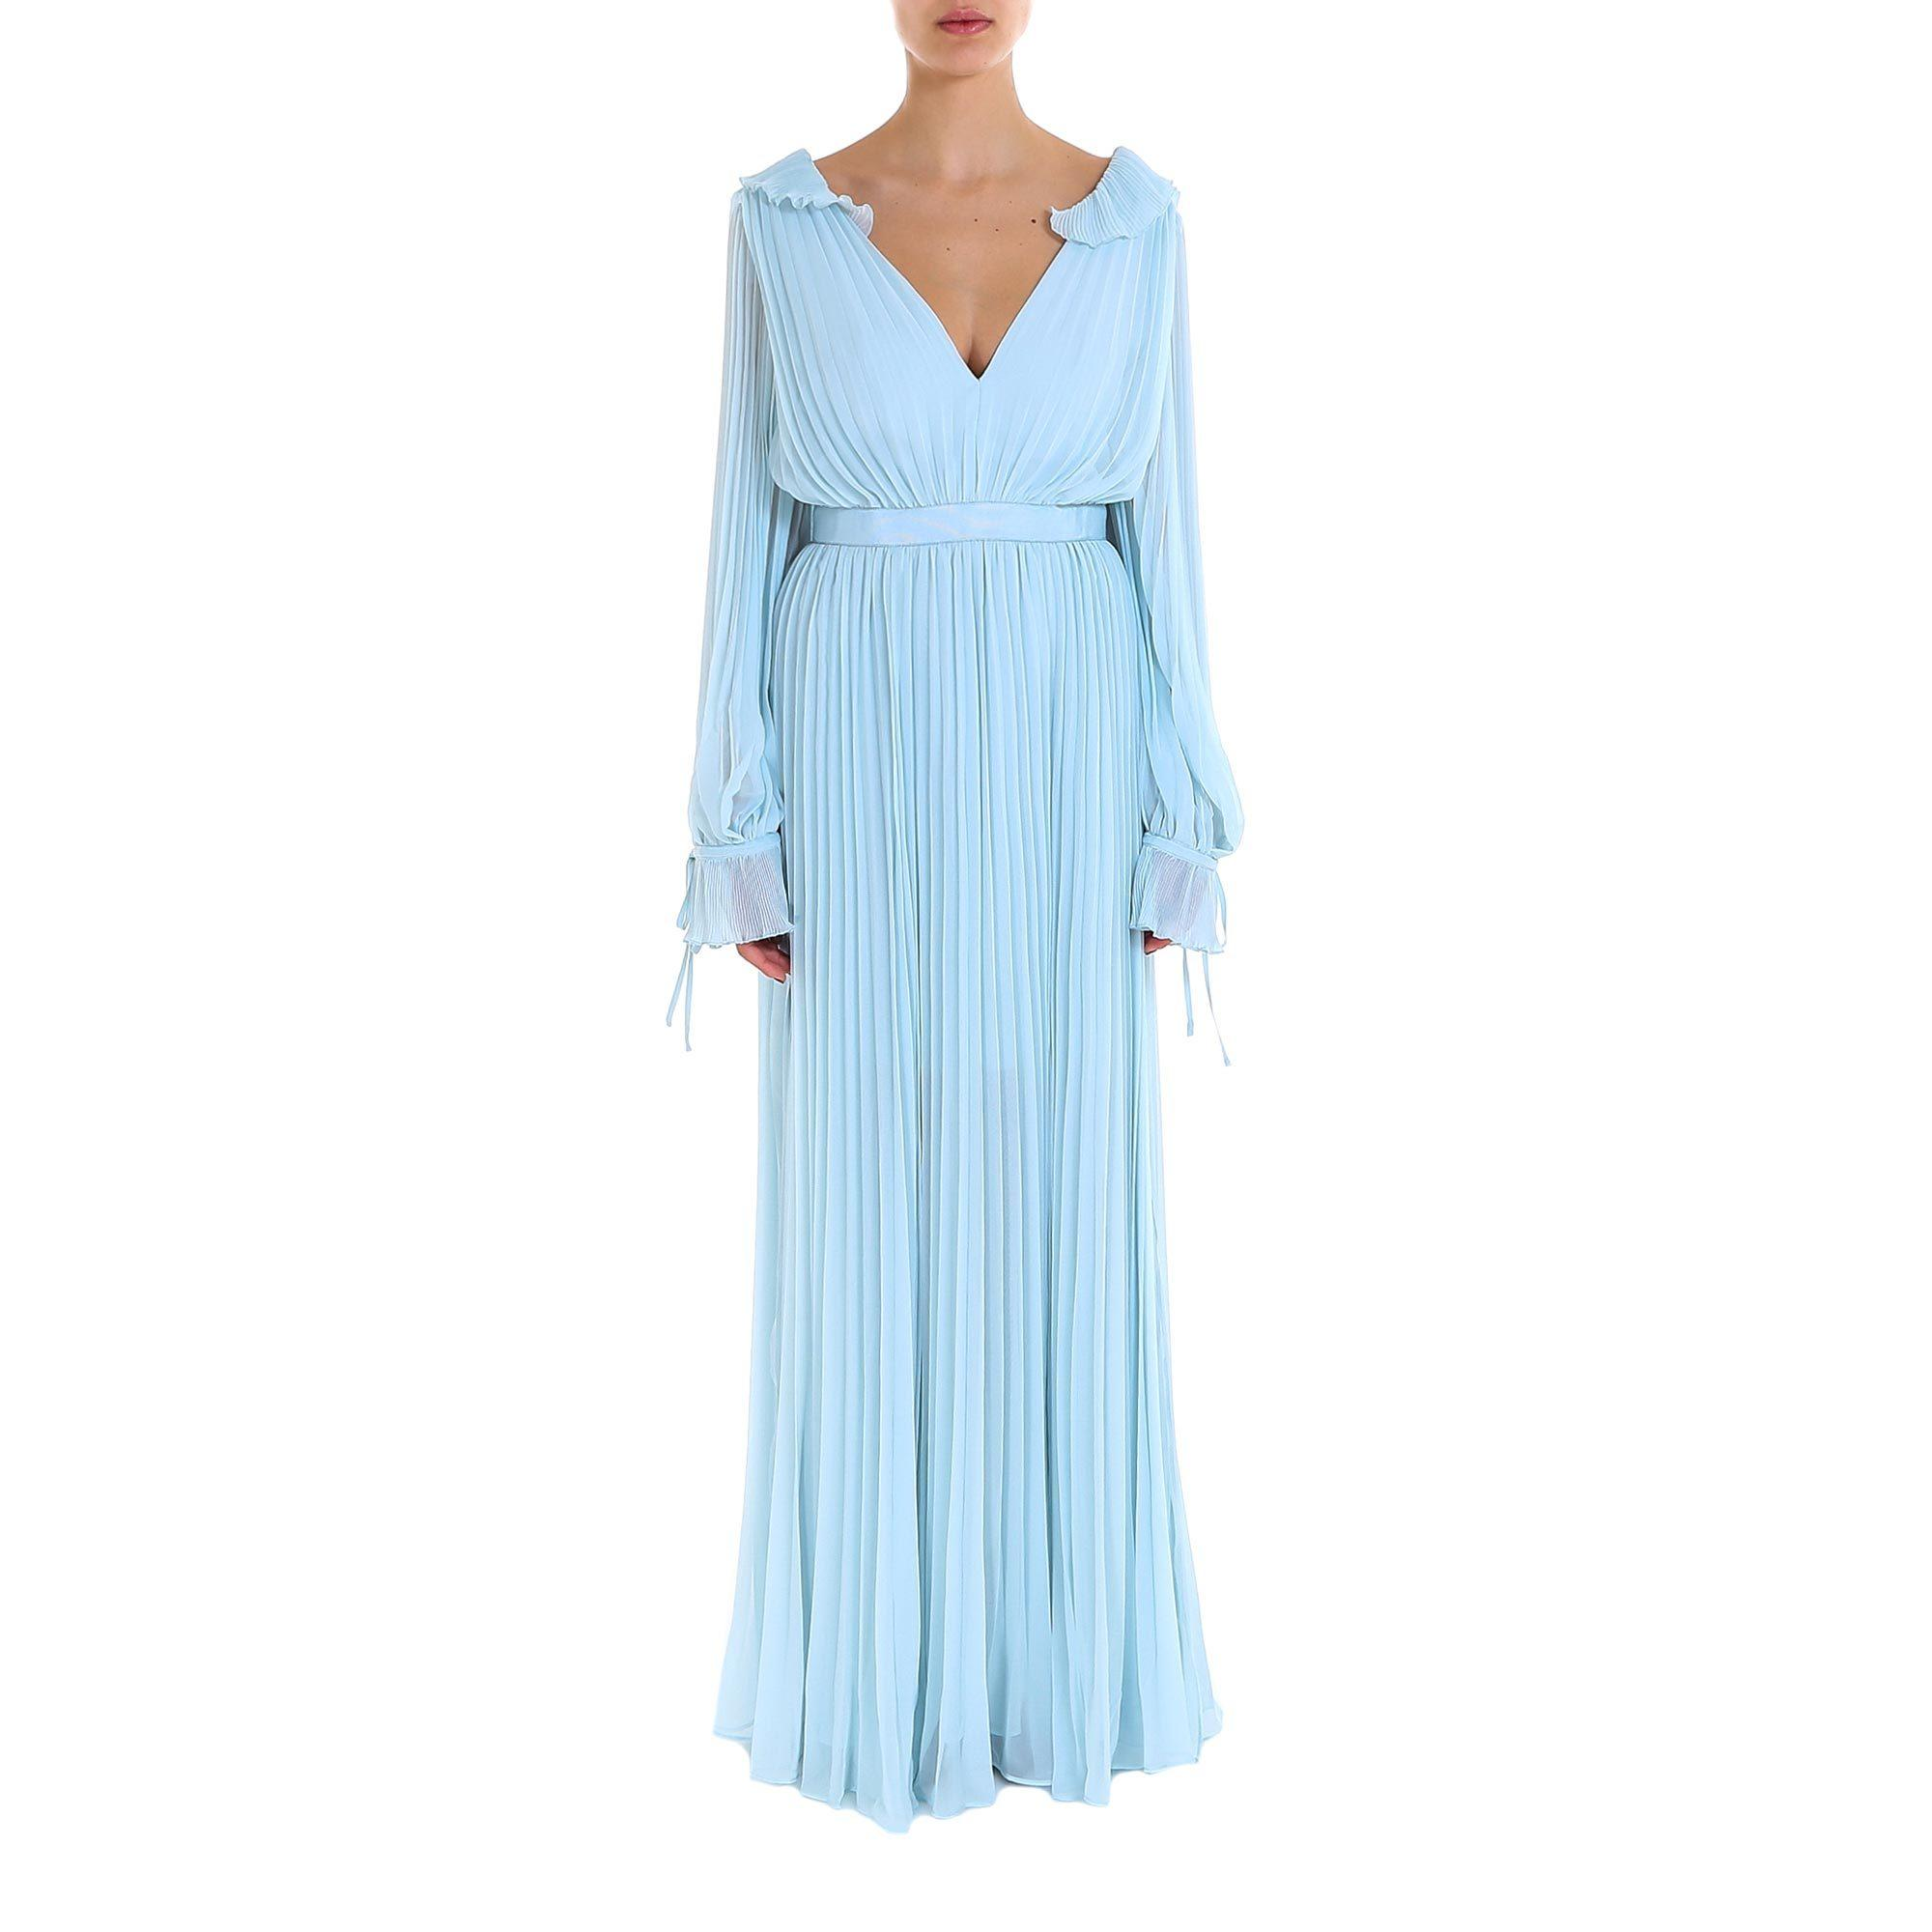 2dbf150a8b81 Self-Portrait Ruffled Pleated Dress in Blue - Lyst